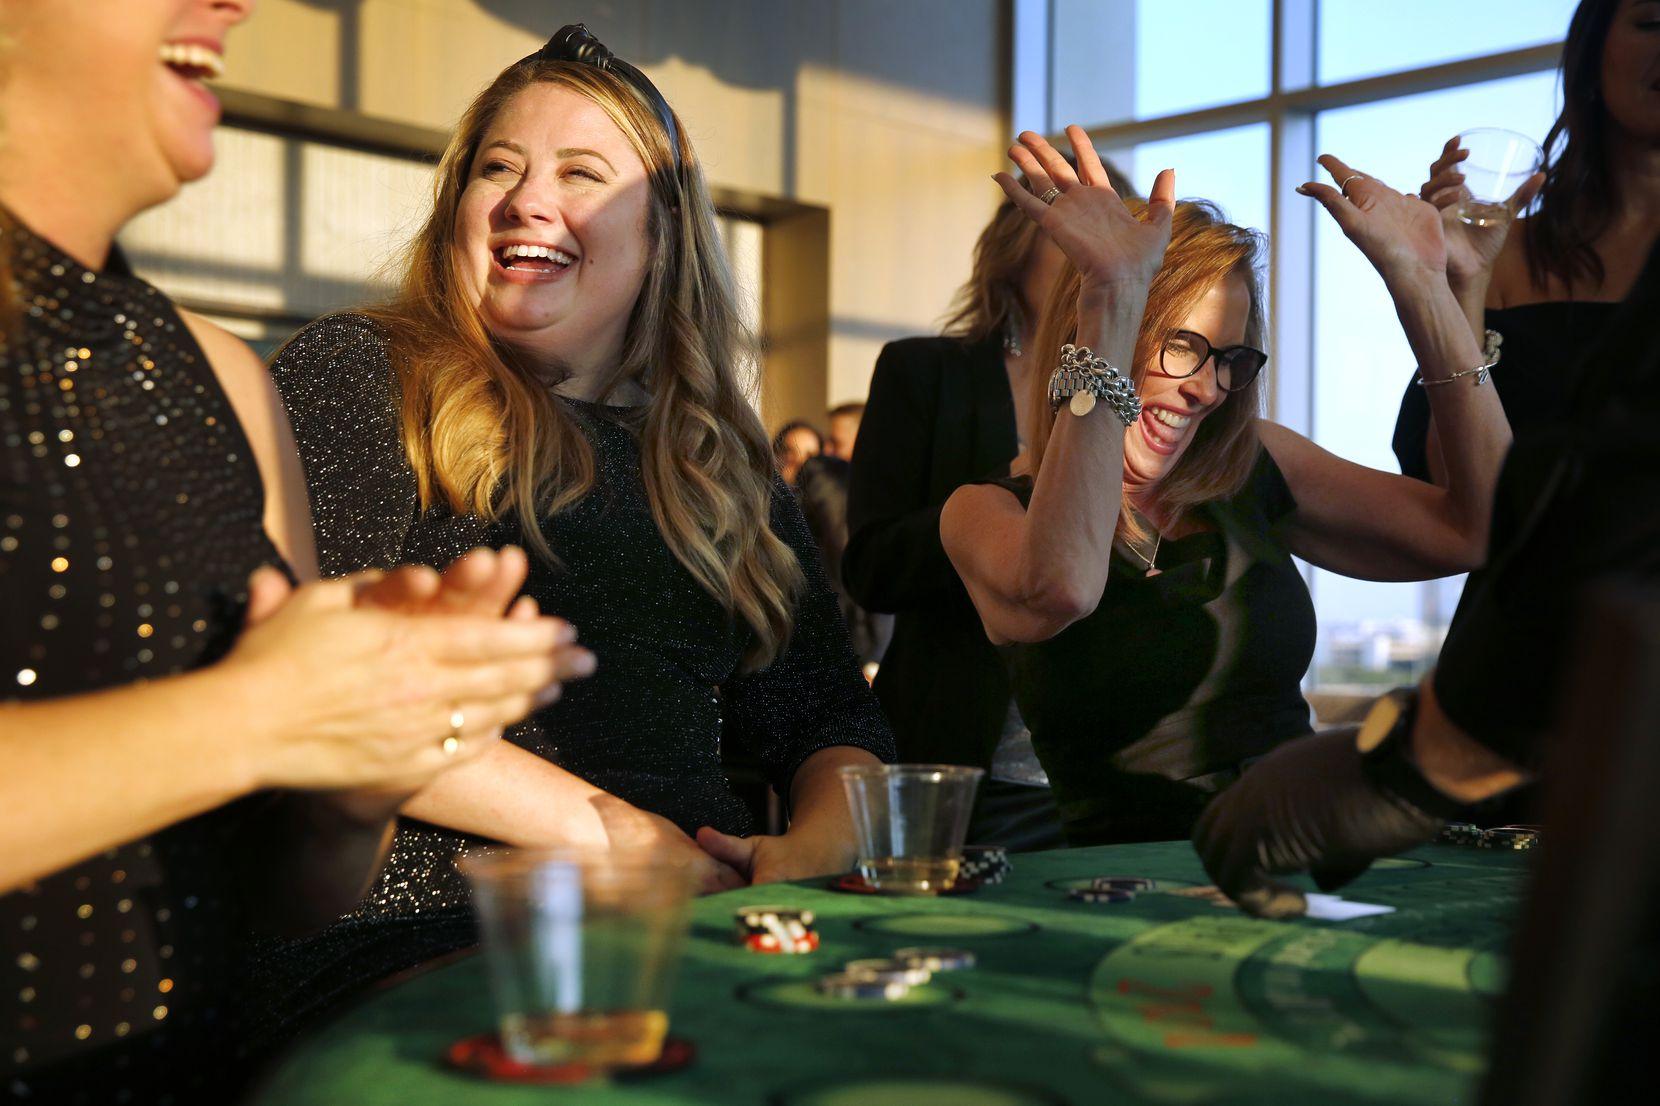 Monument Realty agents Kristi Drayovitch (center) and Brenda Sukenik (right) celebrate a winning blackjack hand at a casino night in August.